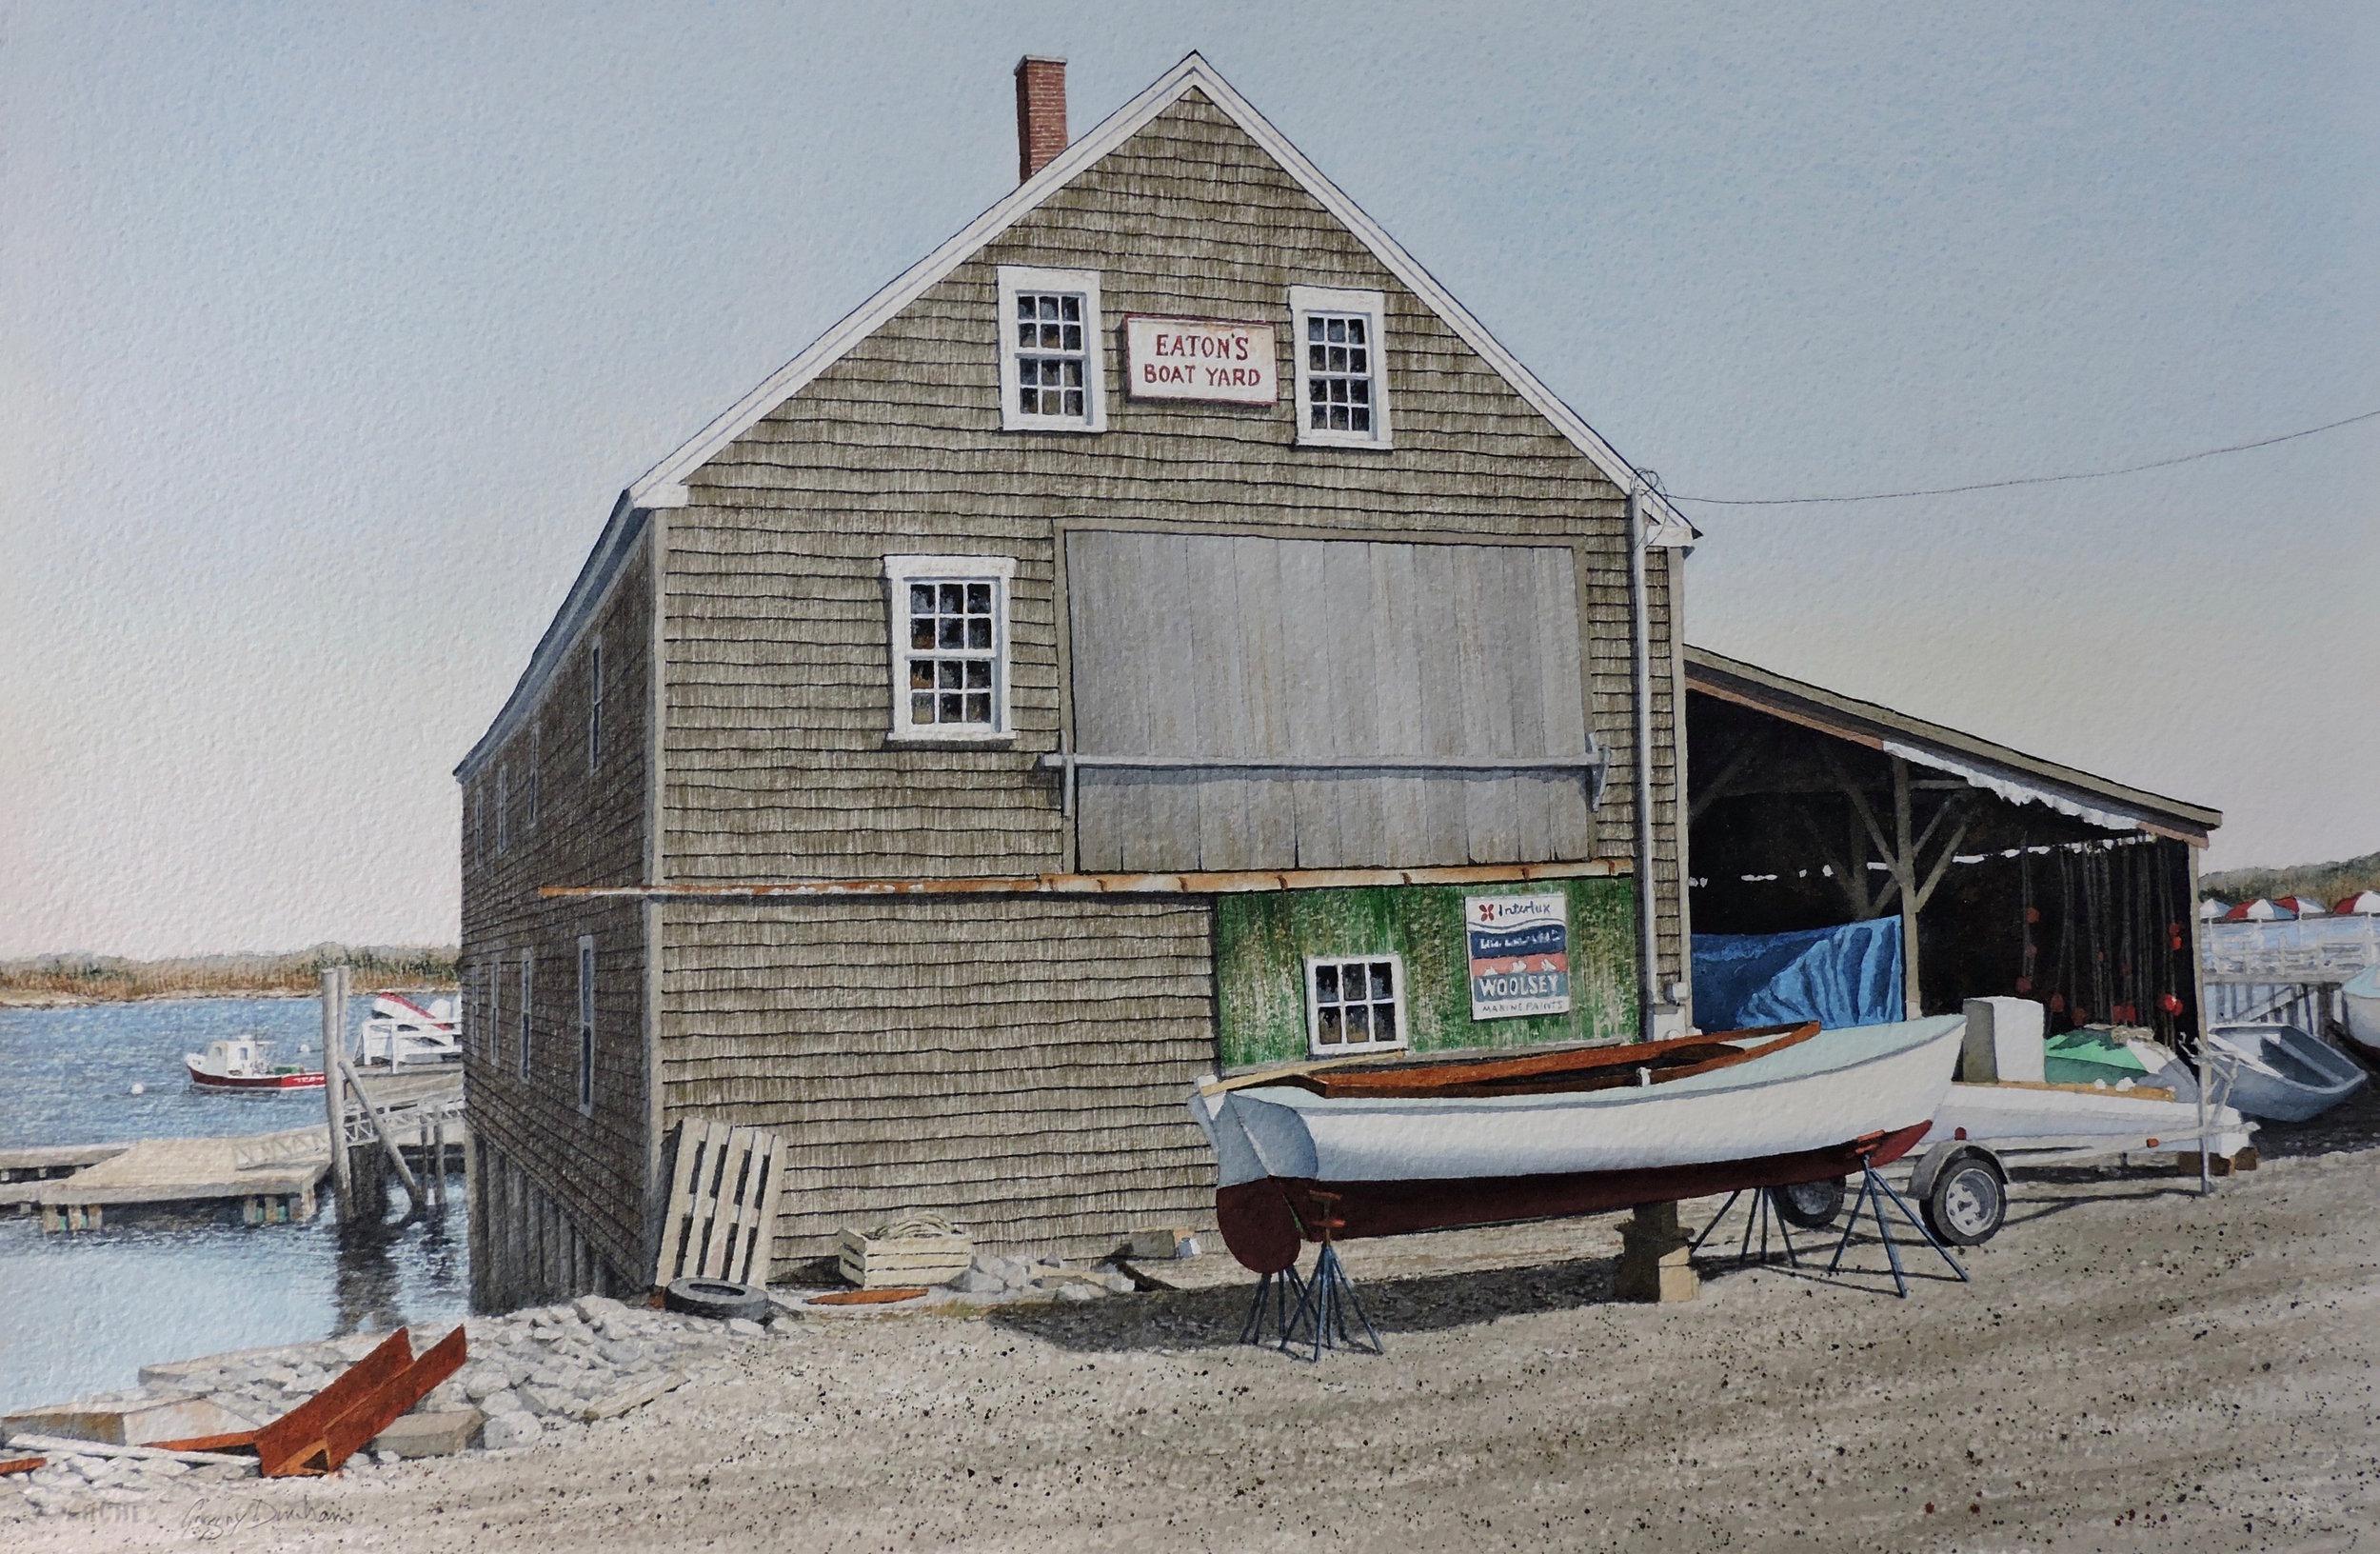 Gregory Dunham - Eaton's BoatyardWatercolor12 x 16 inches2015